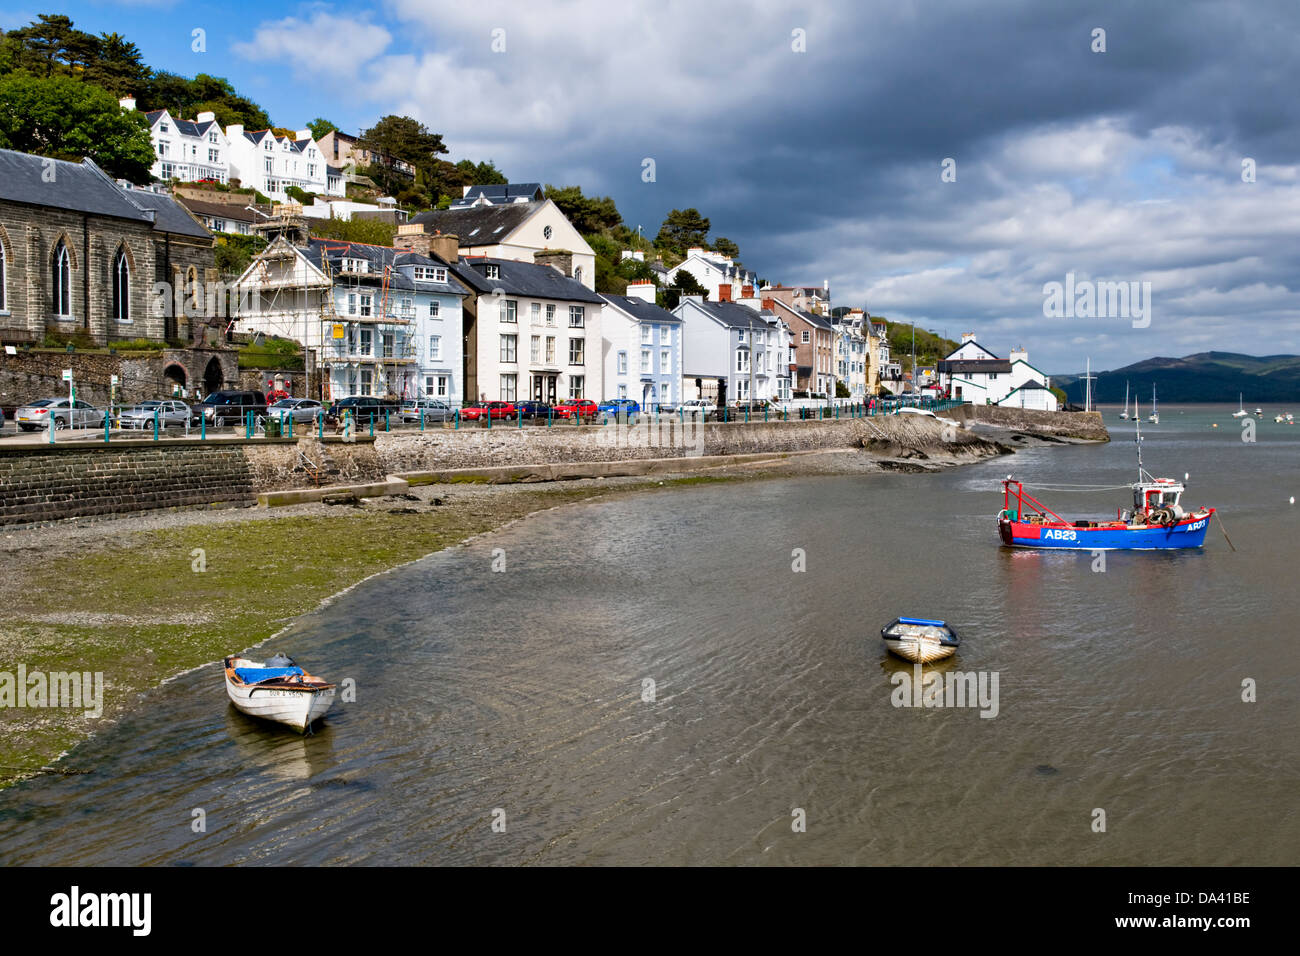 Picturesque sea front at Aberdovey (or Aberdyfi) Gwynedd, Wales, UK taken on fine day Stock Photo